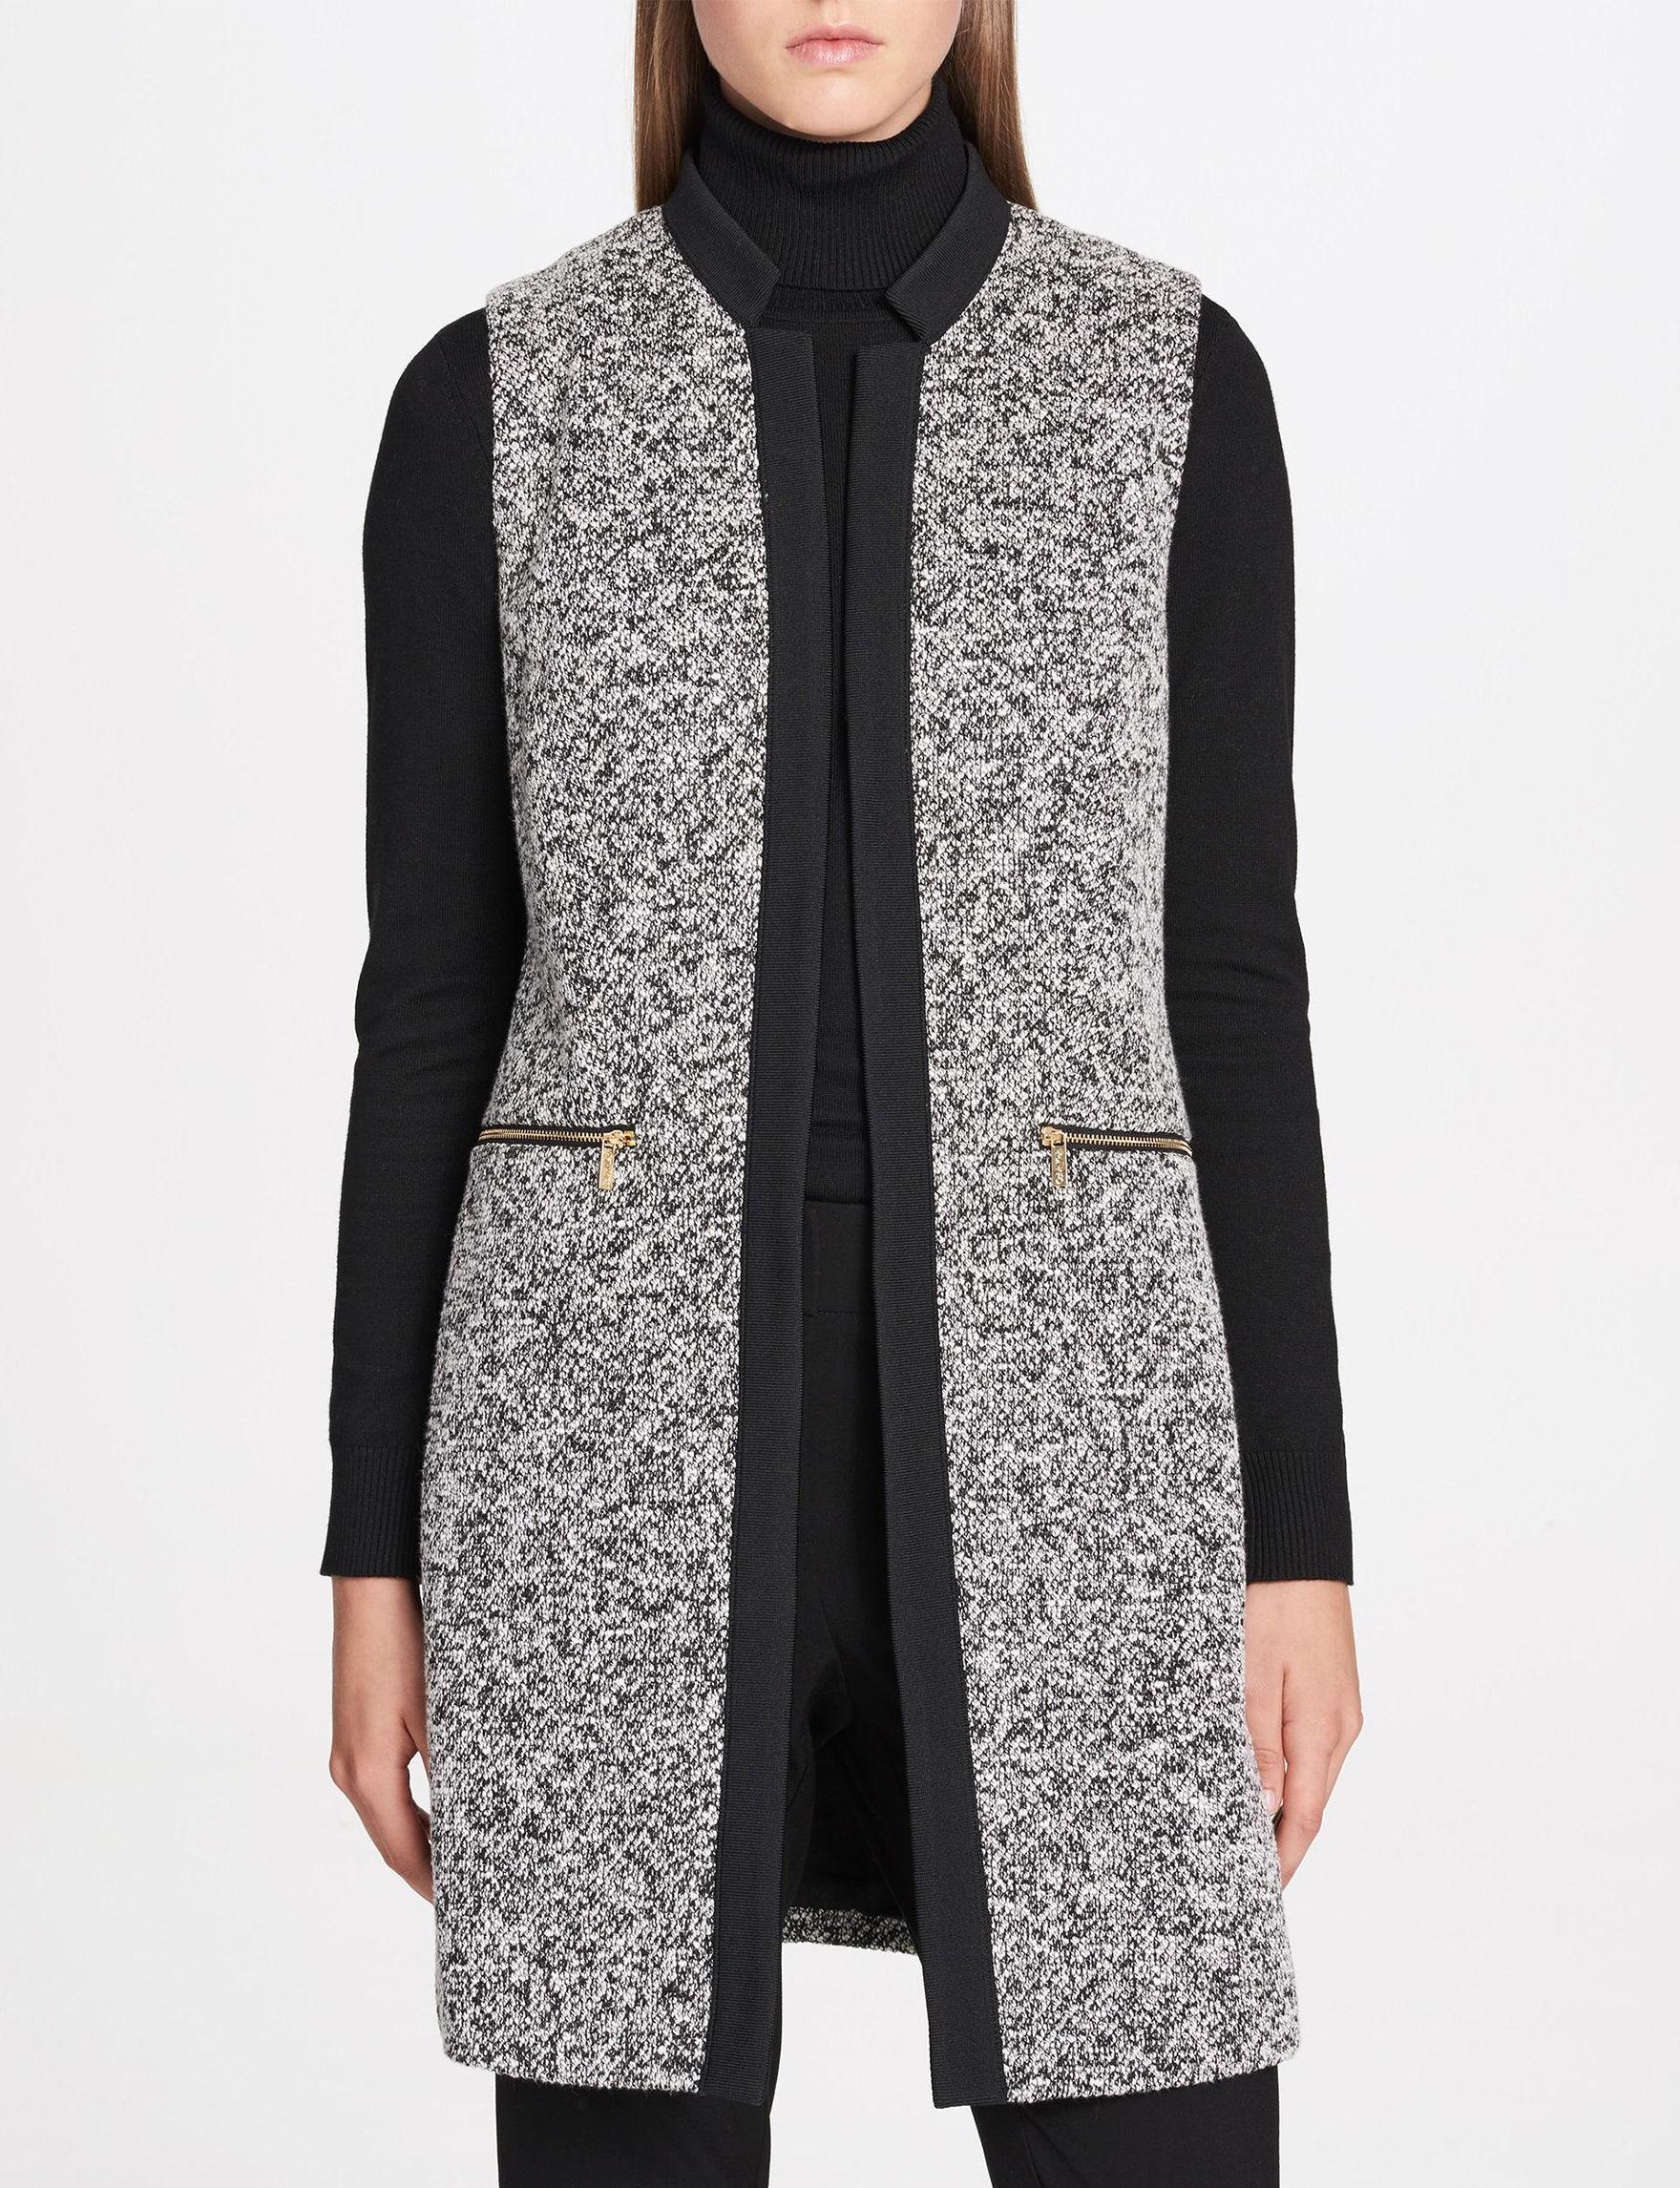 Calvin Klein Black Tunics Vests